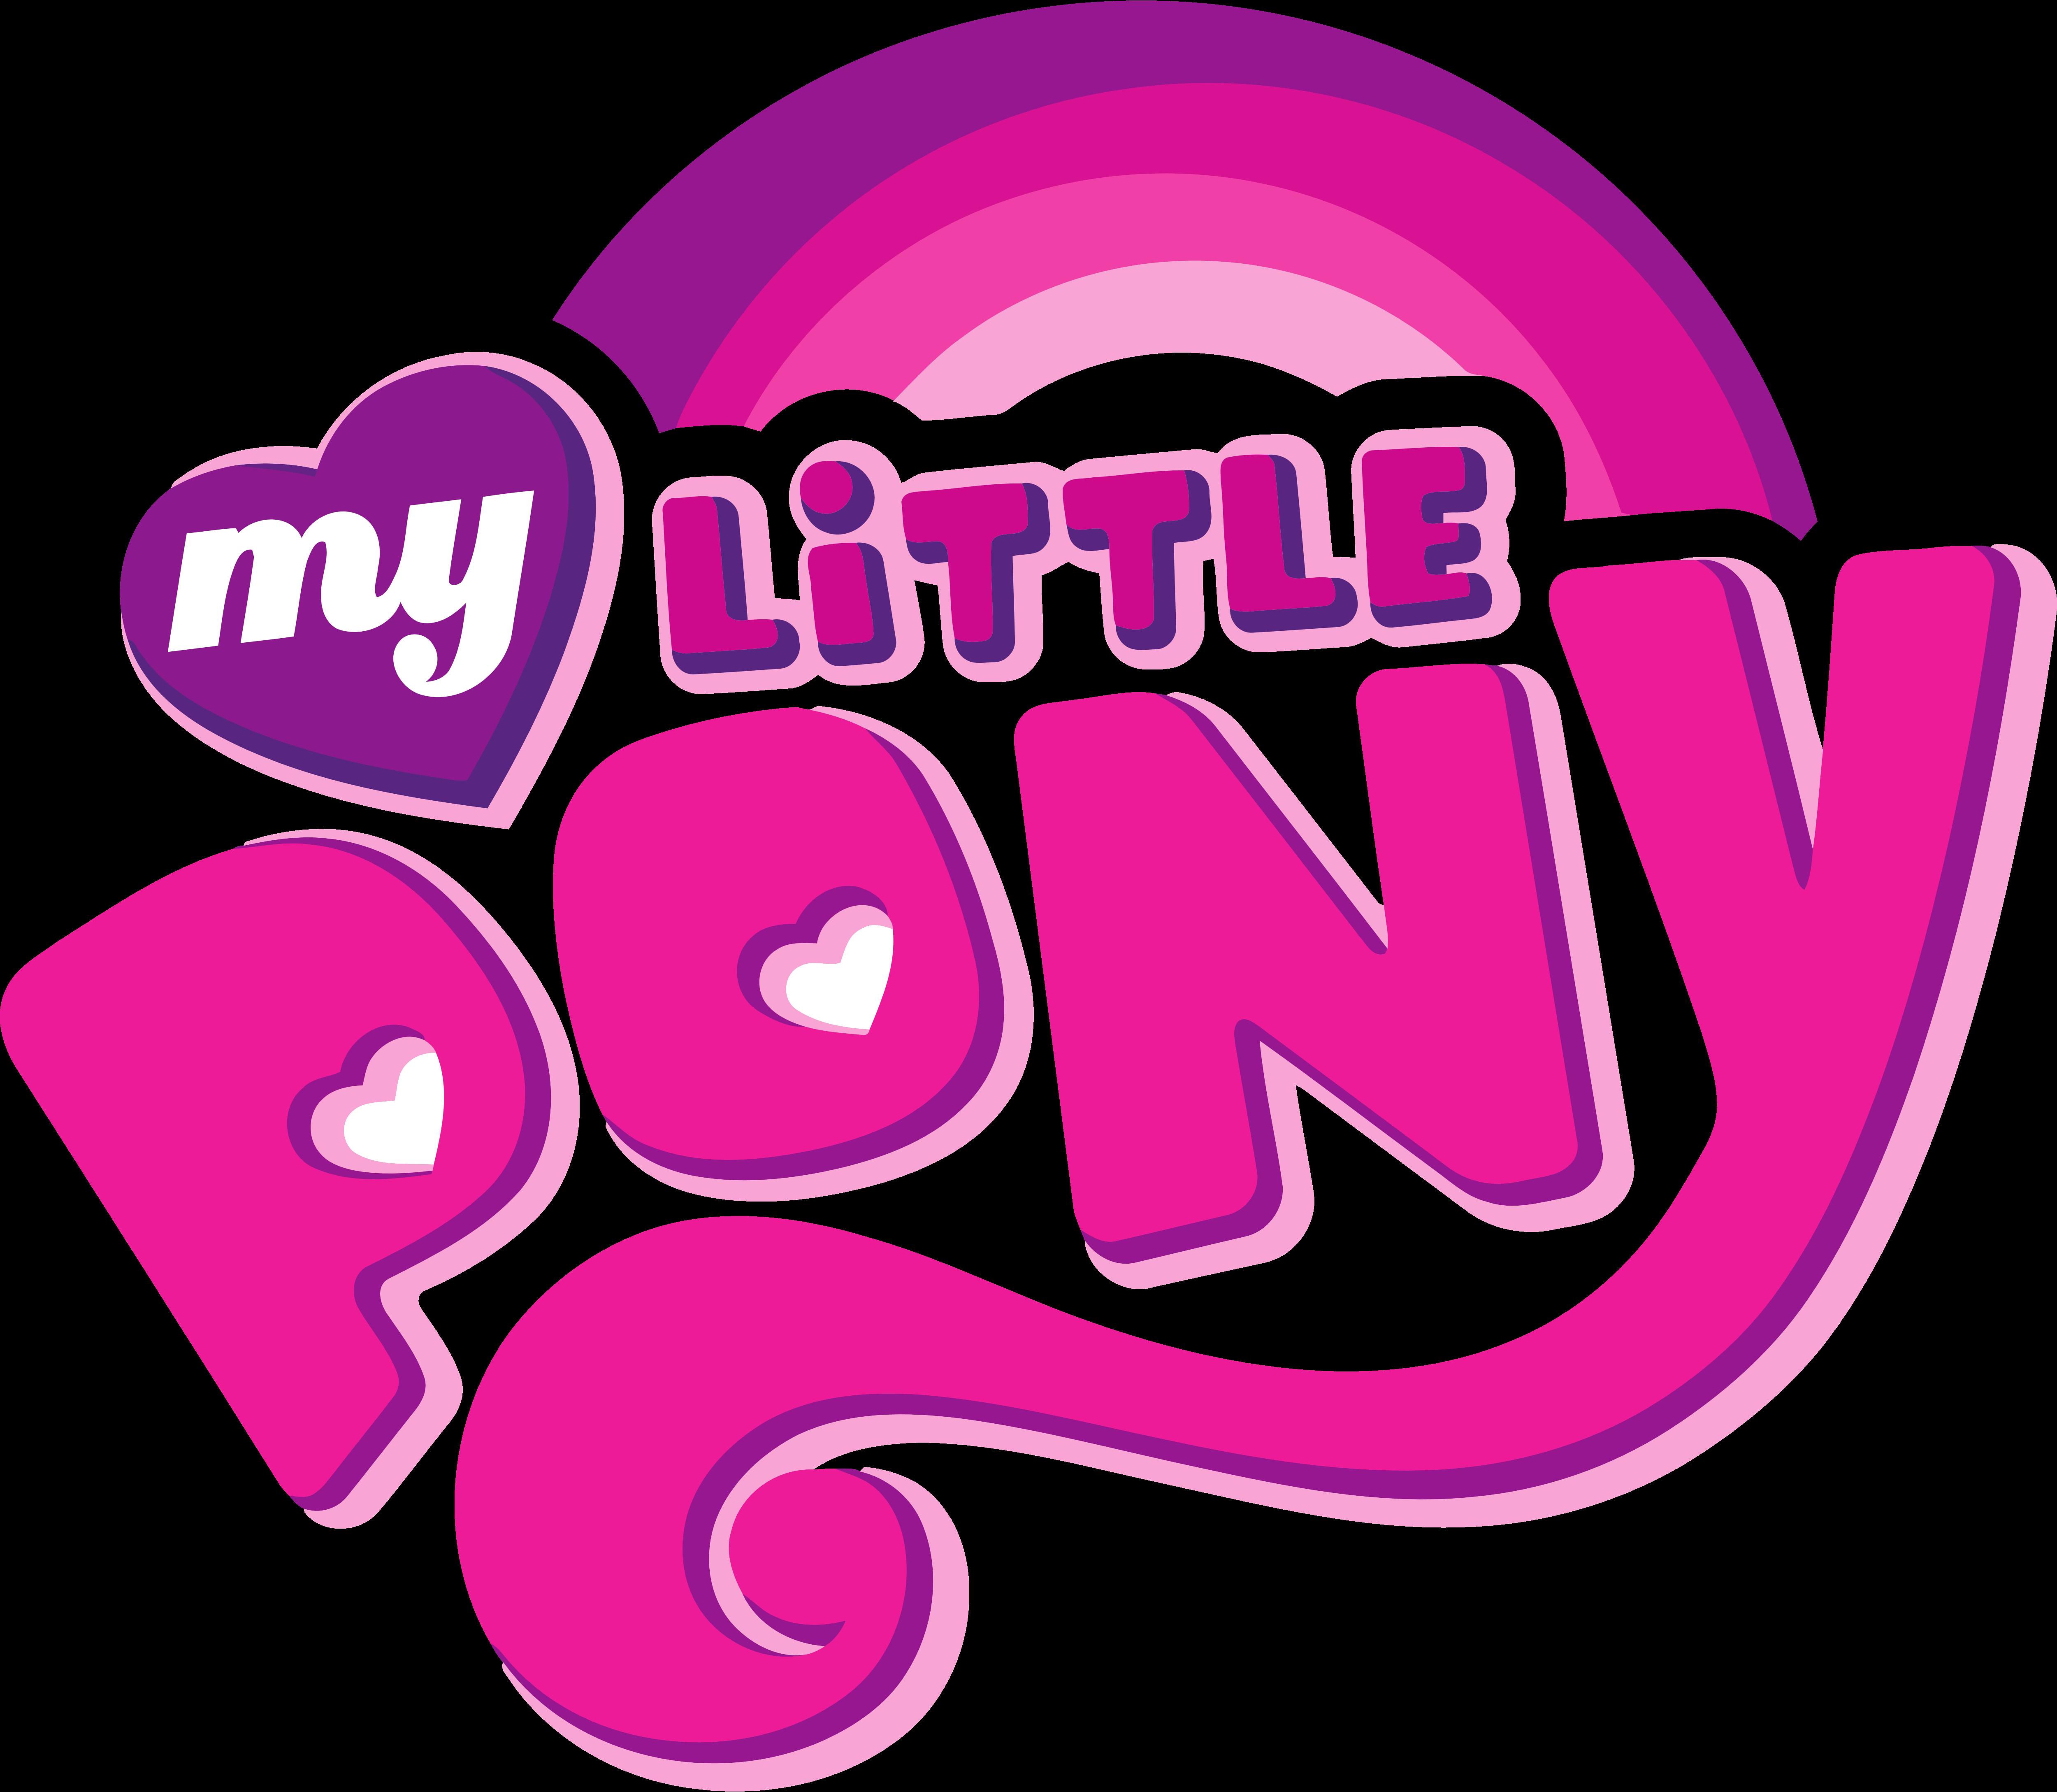 Friendship clipart friendship logo. My little pony is